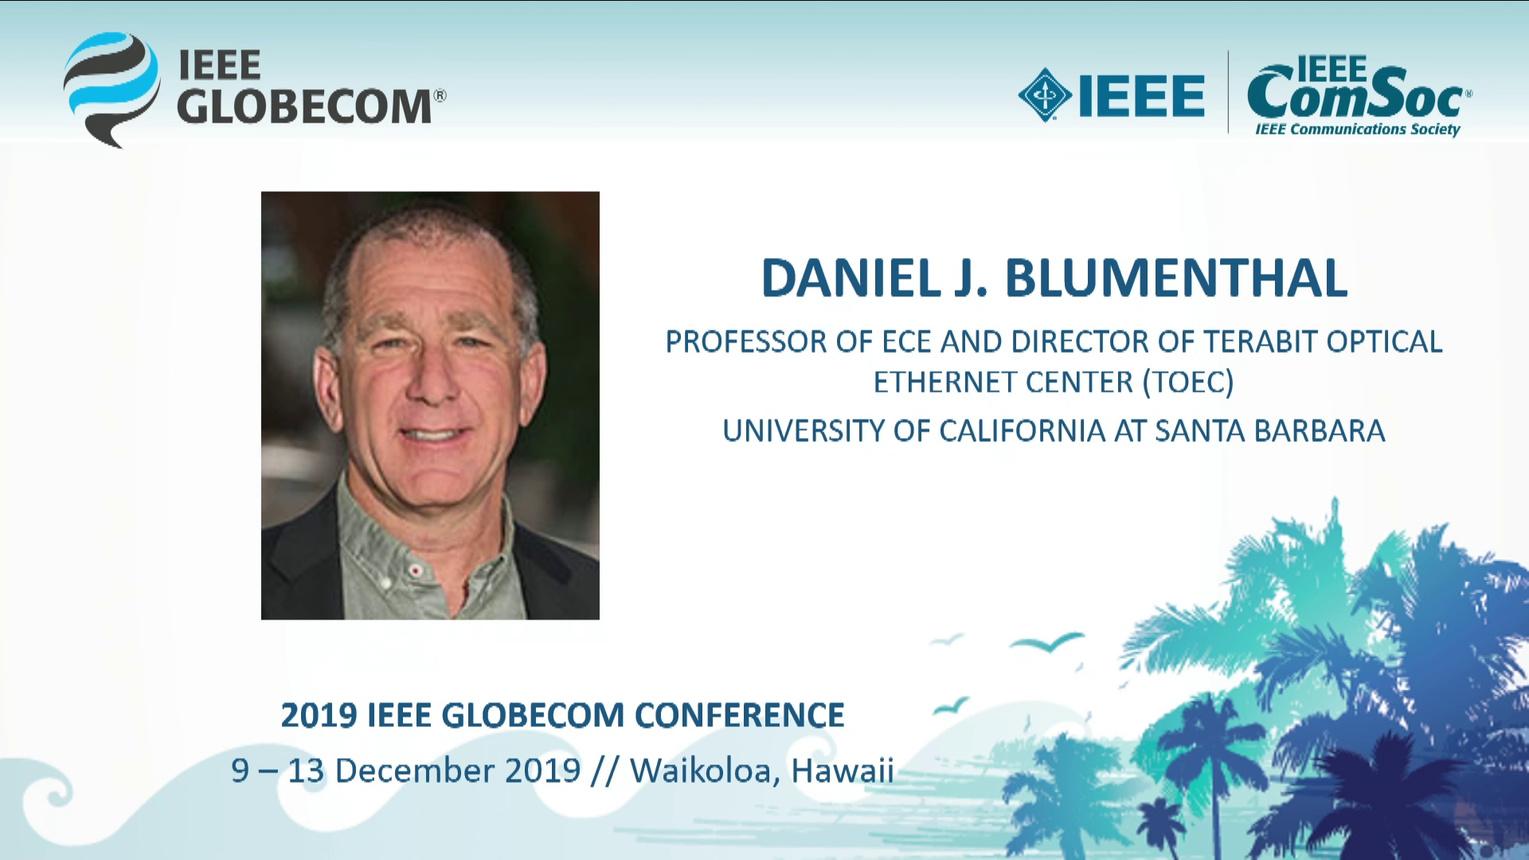 Globecom 2019: Daniel Blumenthal Keynote